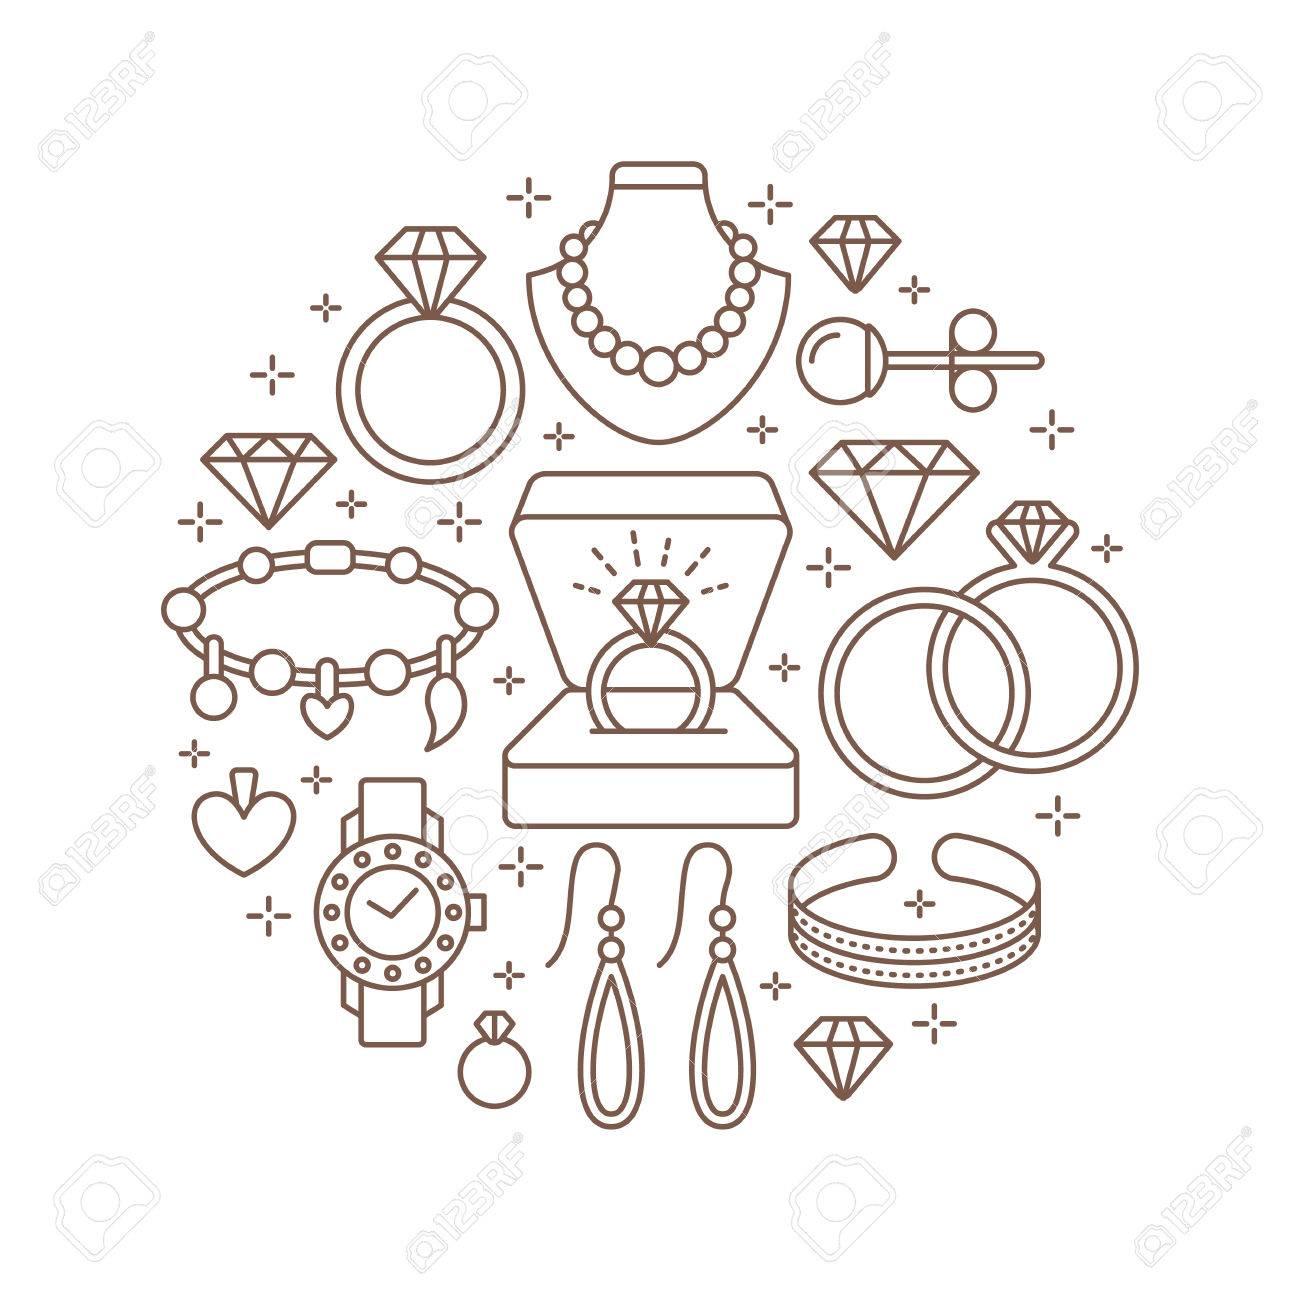 Schmuck-Shop, Diamant-Zubehör Banner Illustration. Vector Line Icon ...